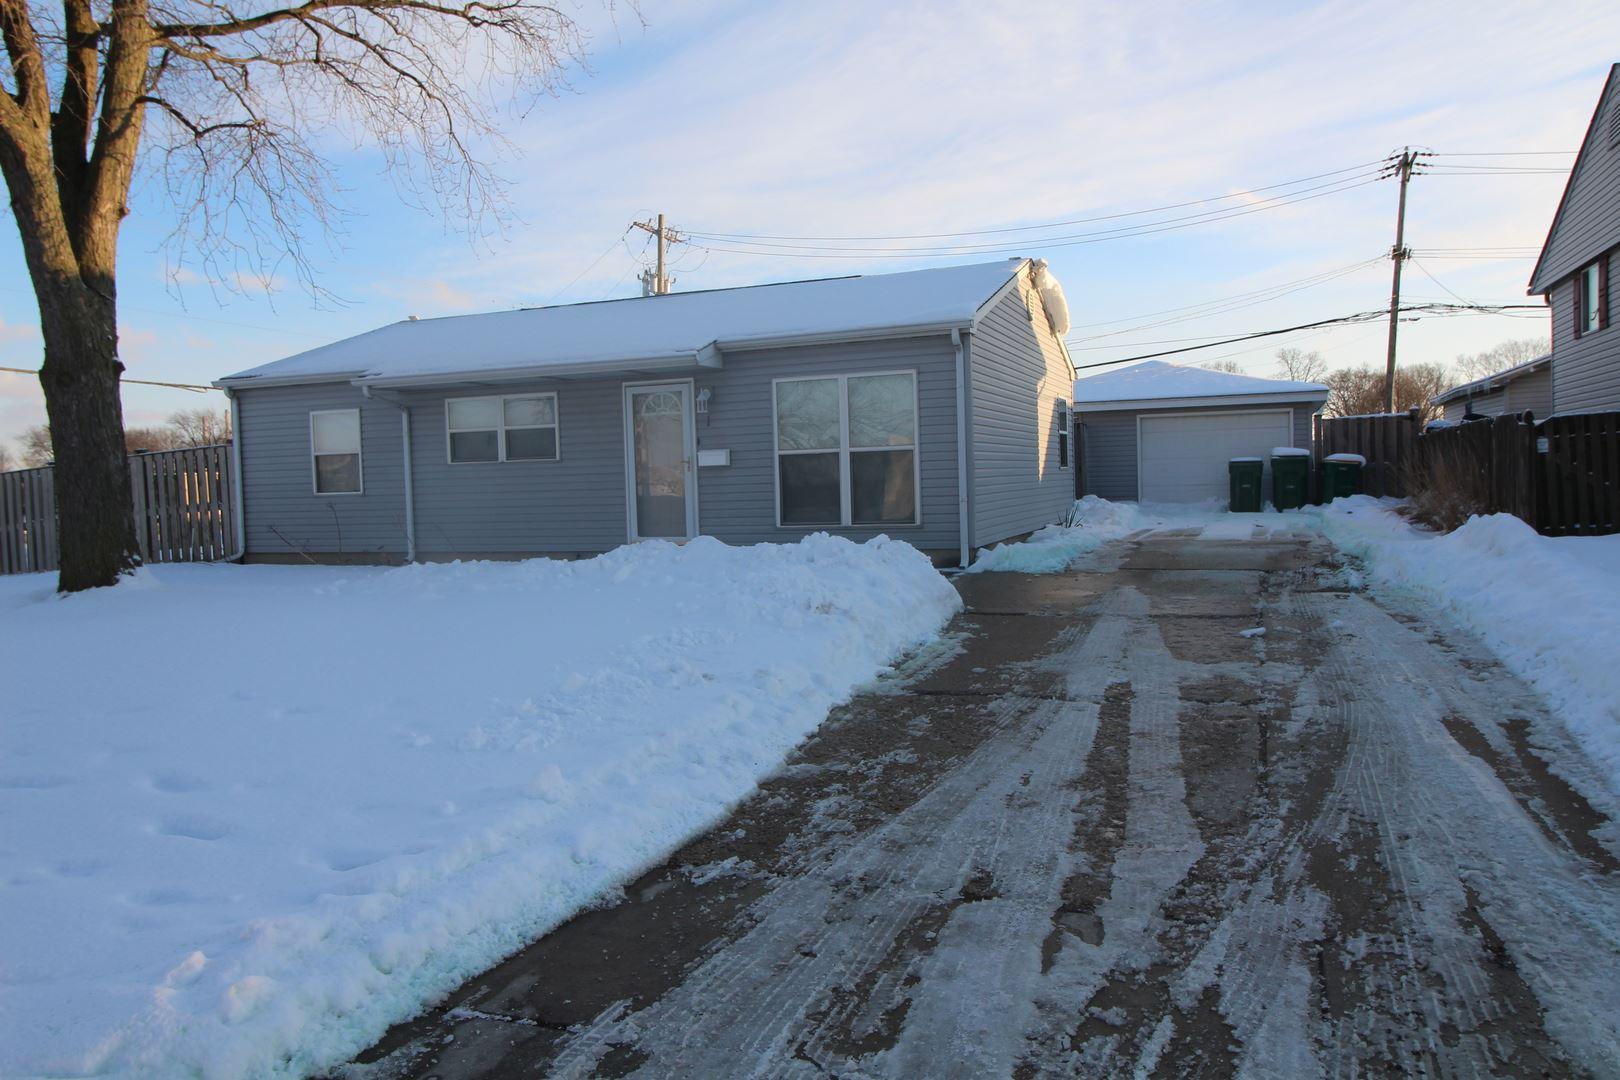 Photo of 1 Elgin Avenue, Romeoville, IL 60446 (MLS # 10988975)